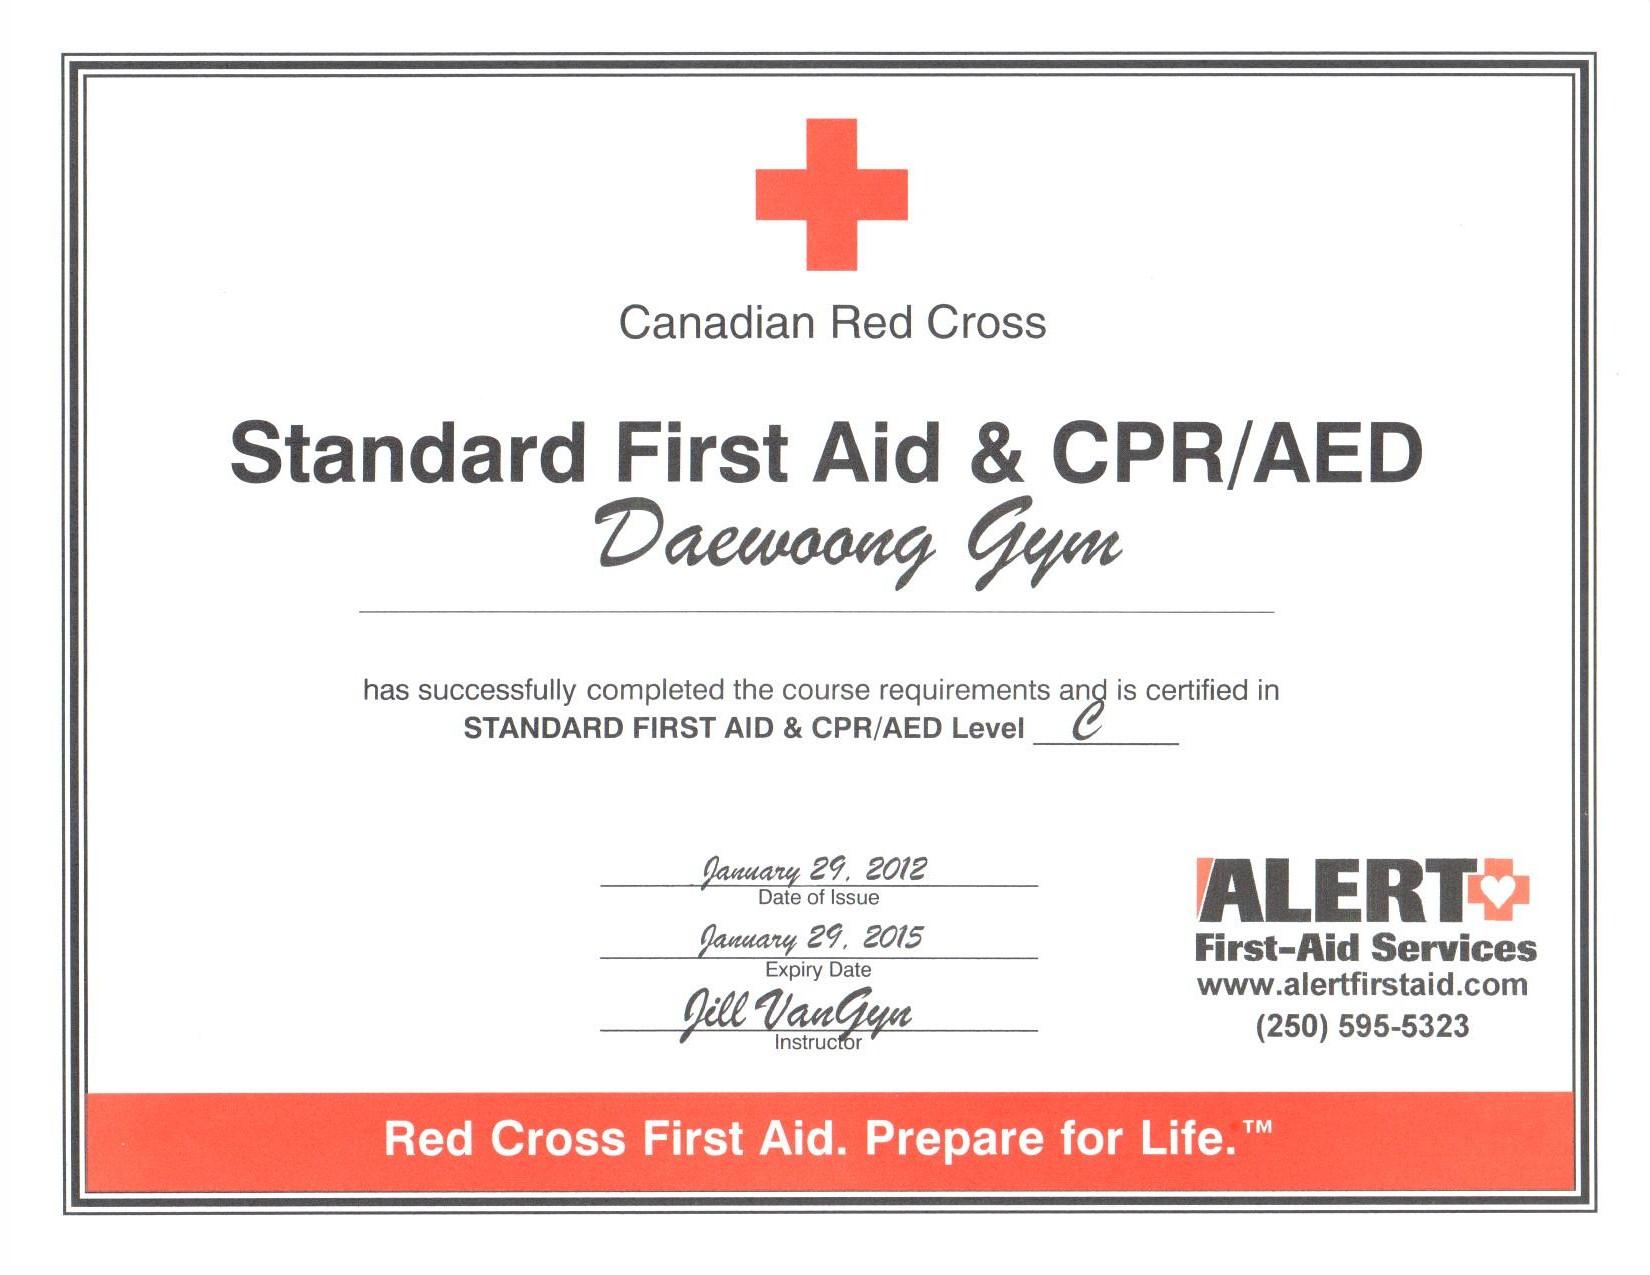 First Aid Canadapga